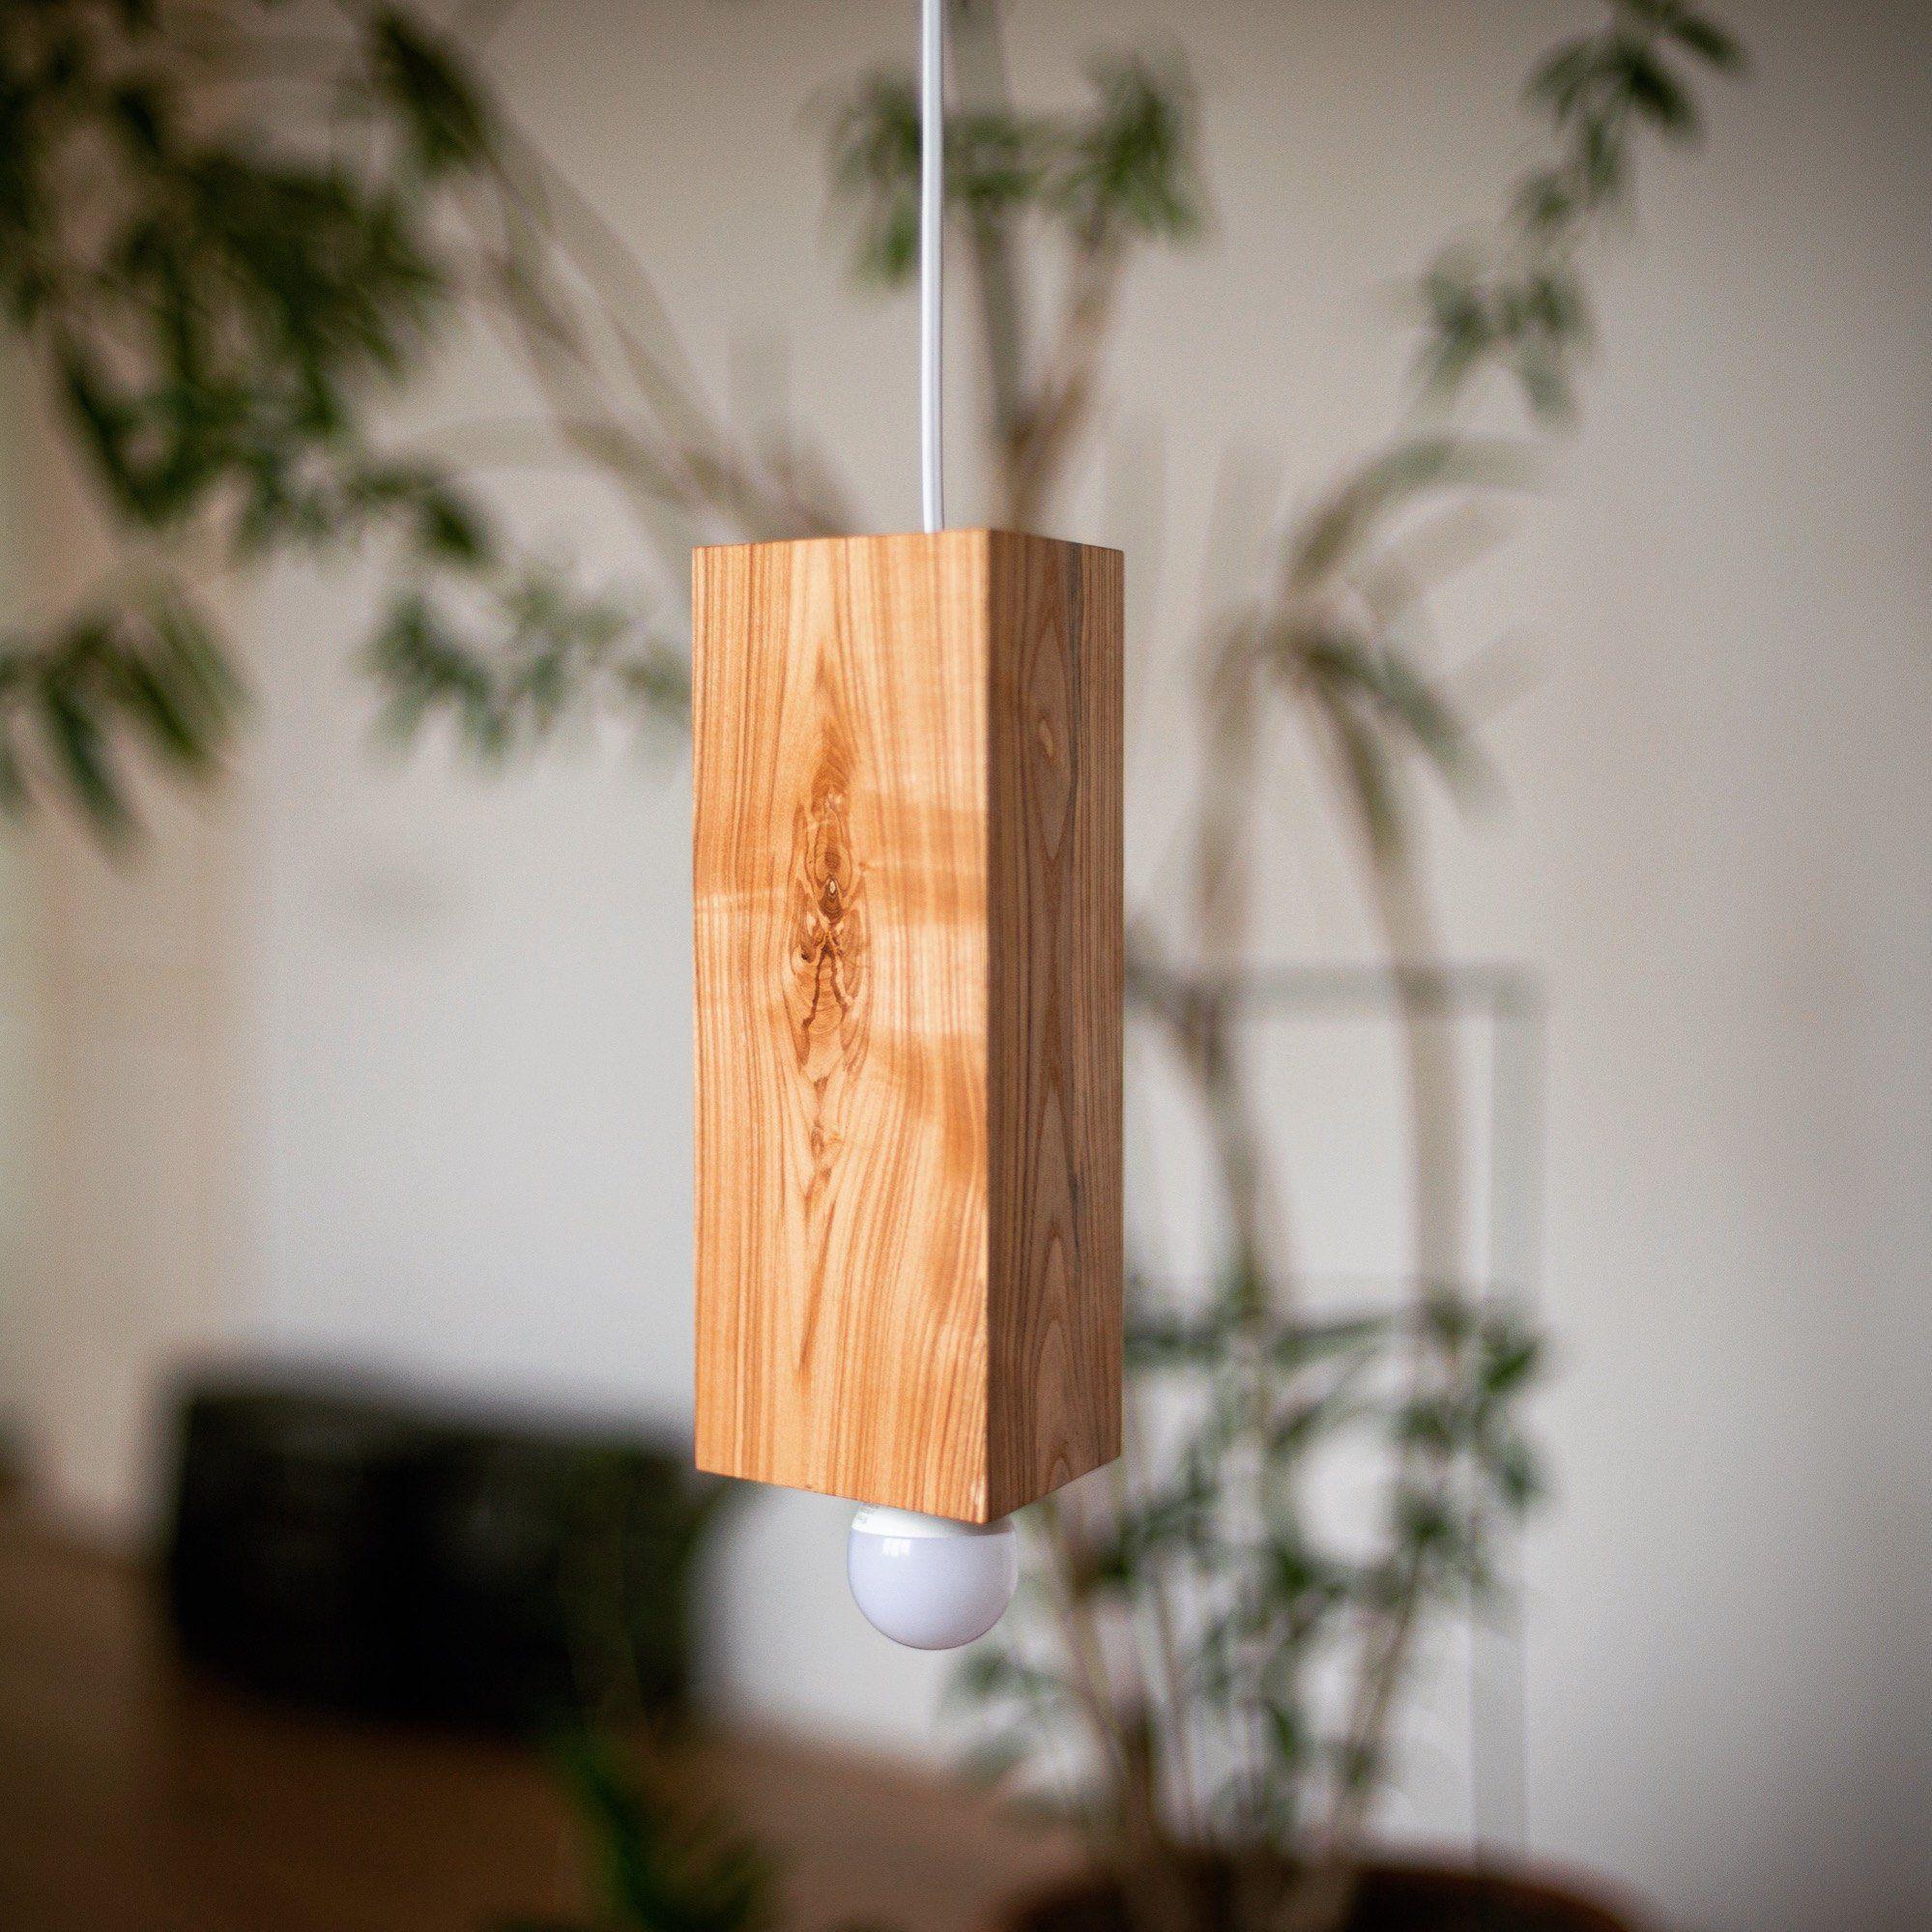 Base#3 Wooden Lamp @ Dtchsscom #Wood #Woodenlamp #